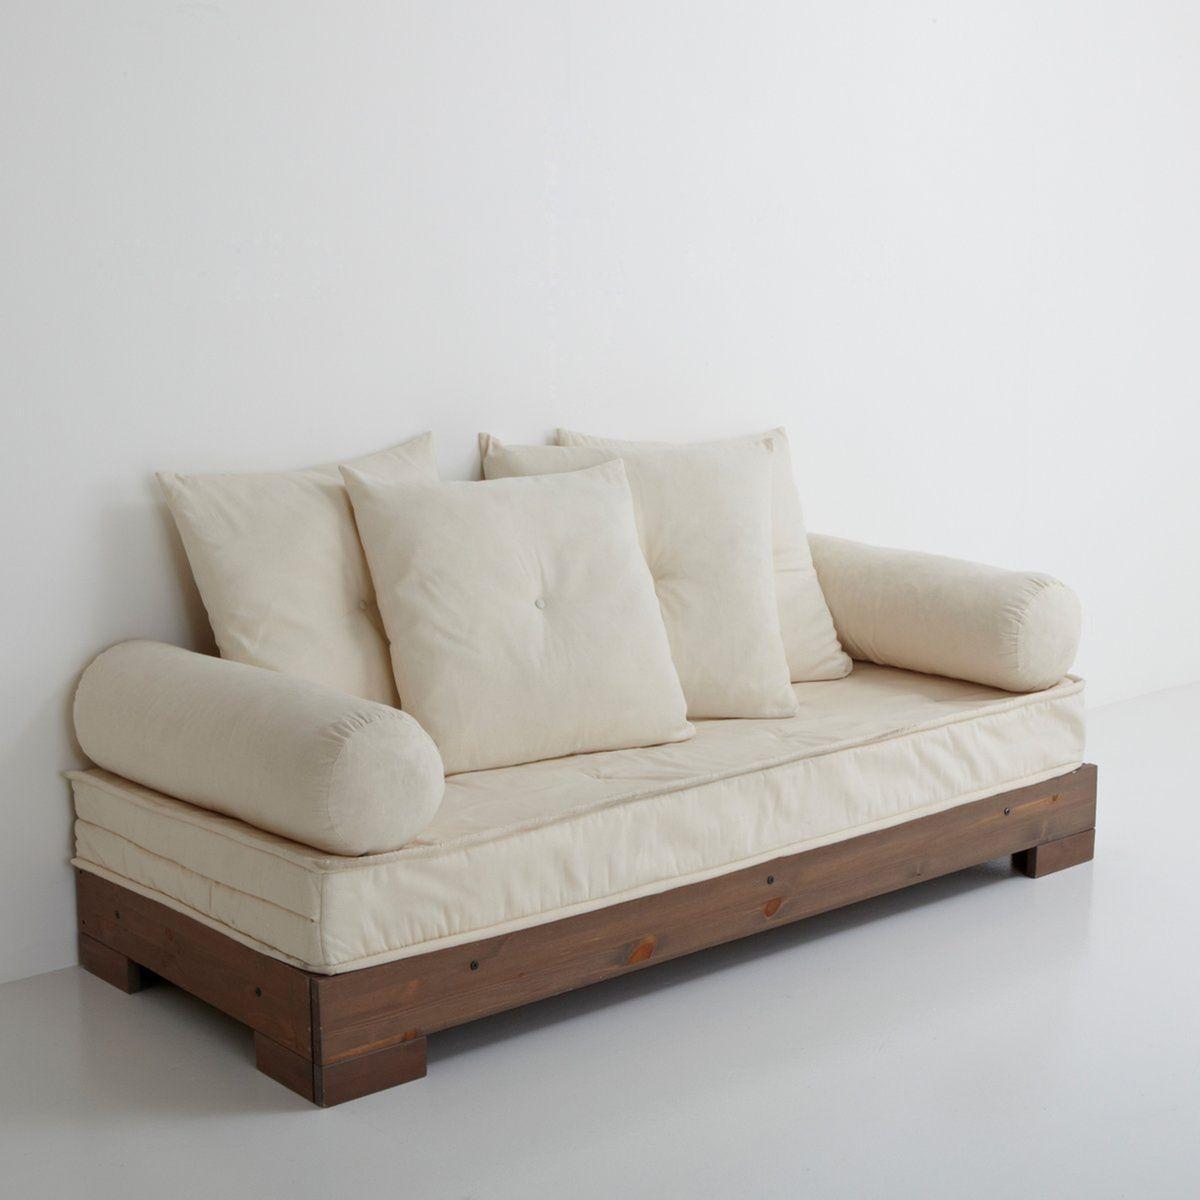 vente banquette banquette tritoo maison et jardin. Black Bedroom Furniture Sets. Home Design Ideas